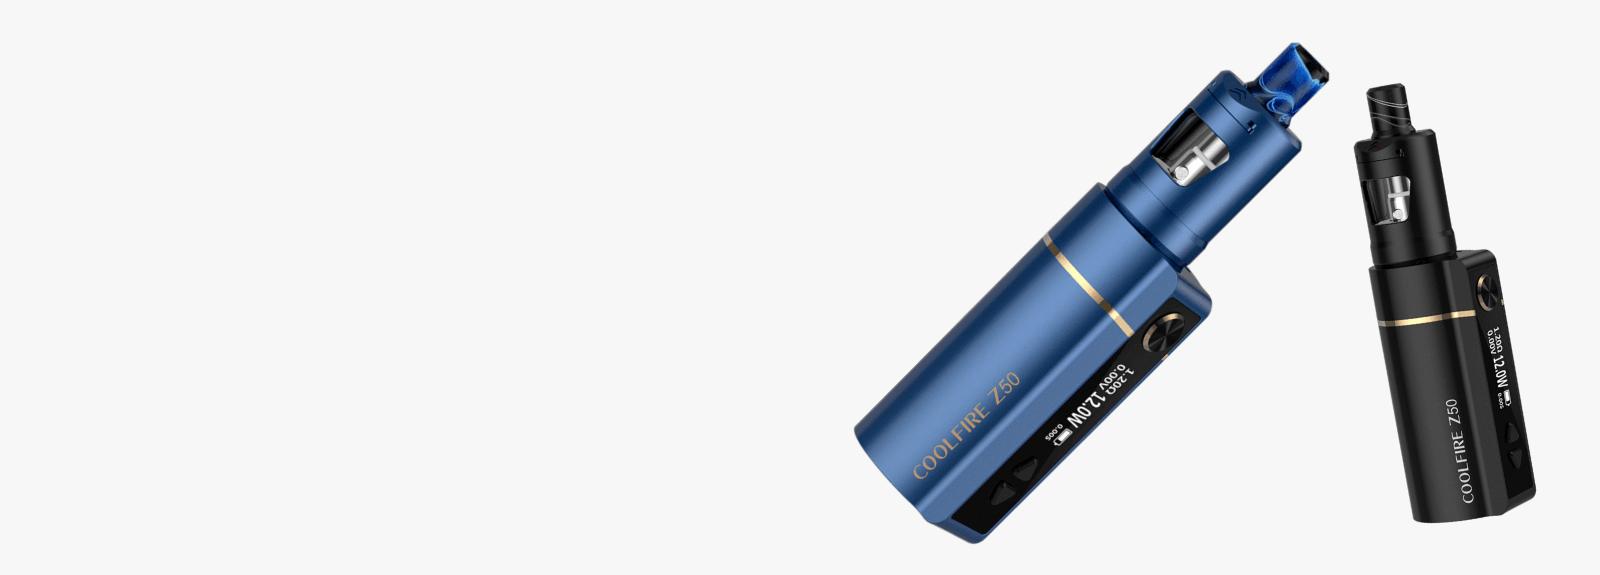 Innokin Coolfire Z50 Zlide Kit